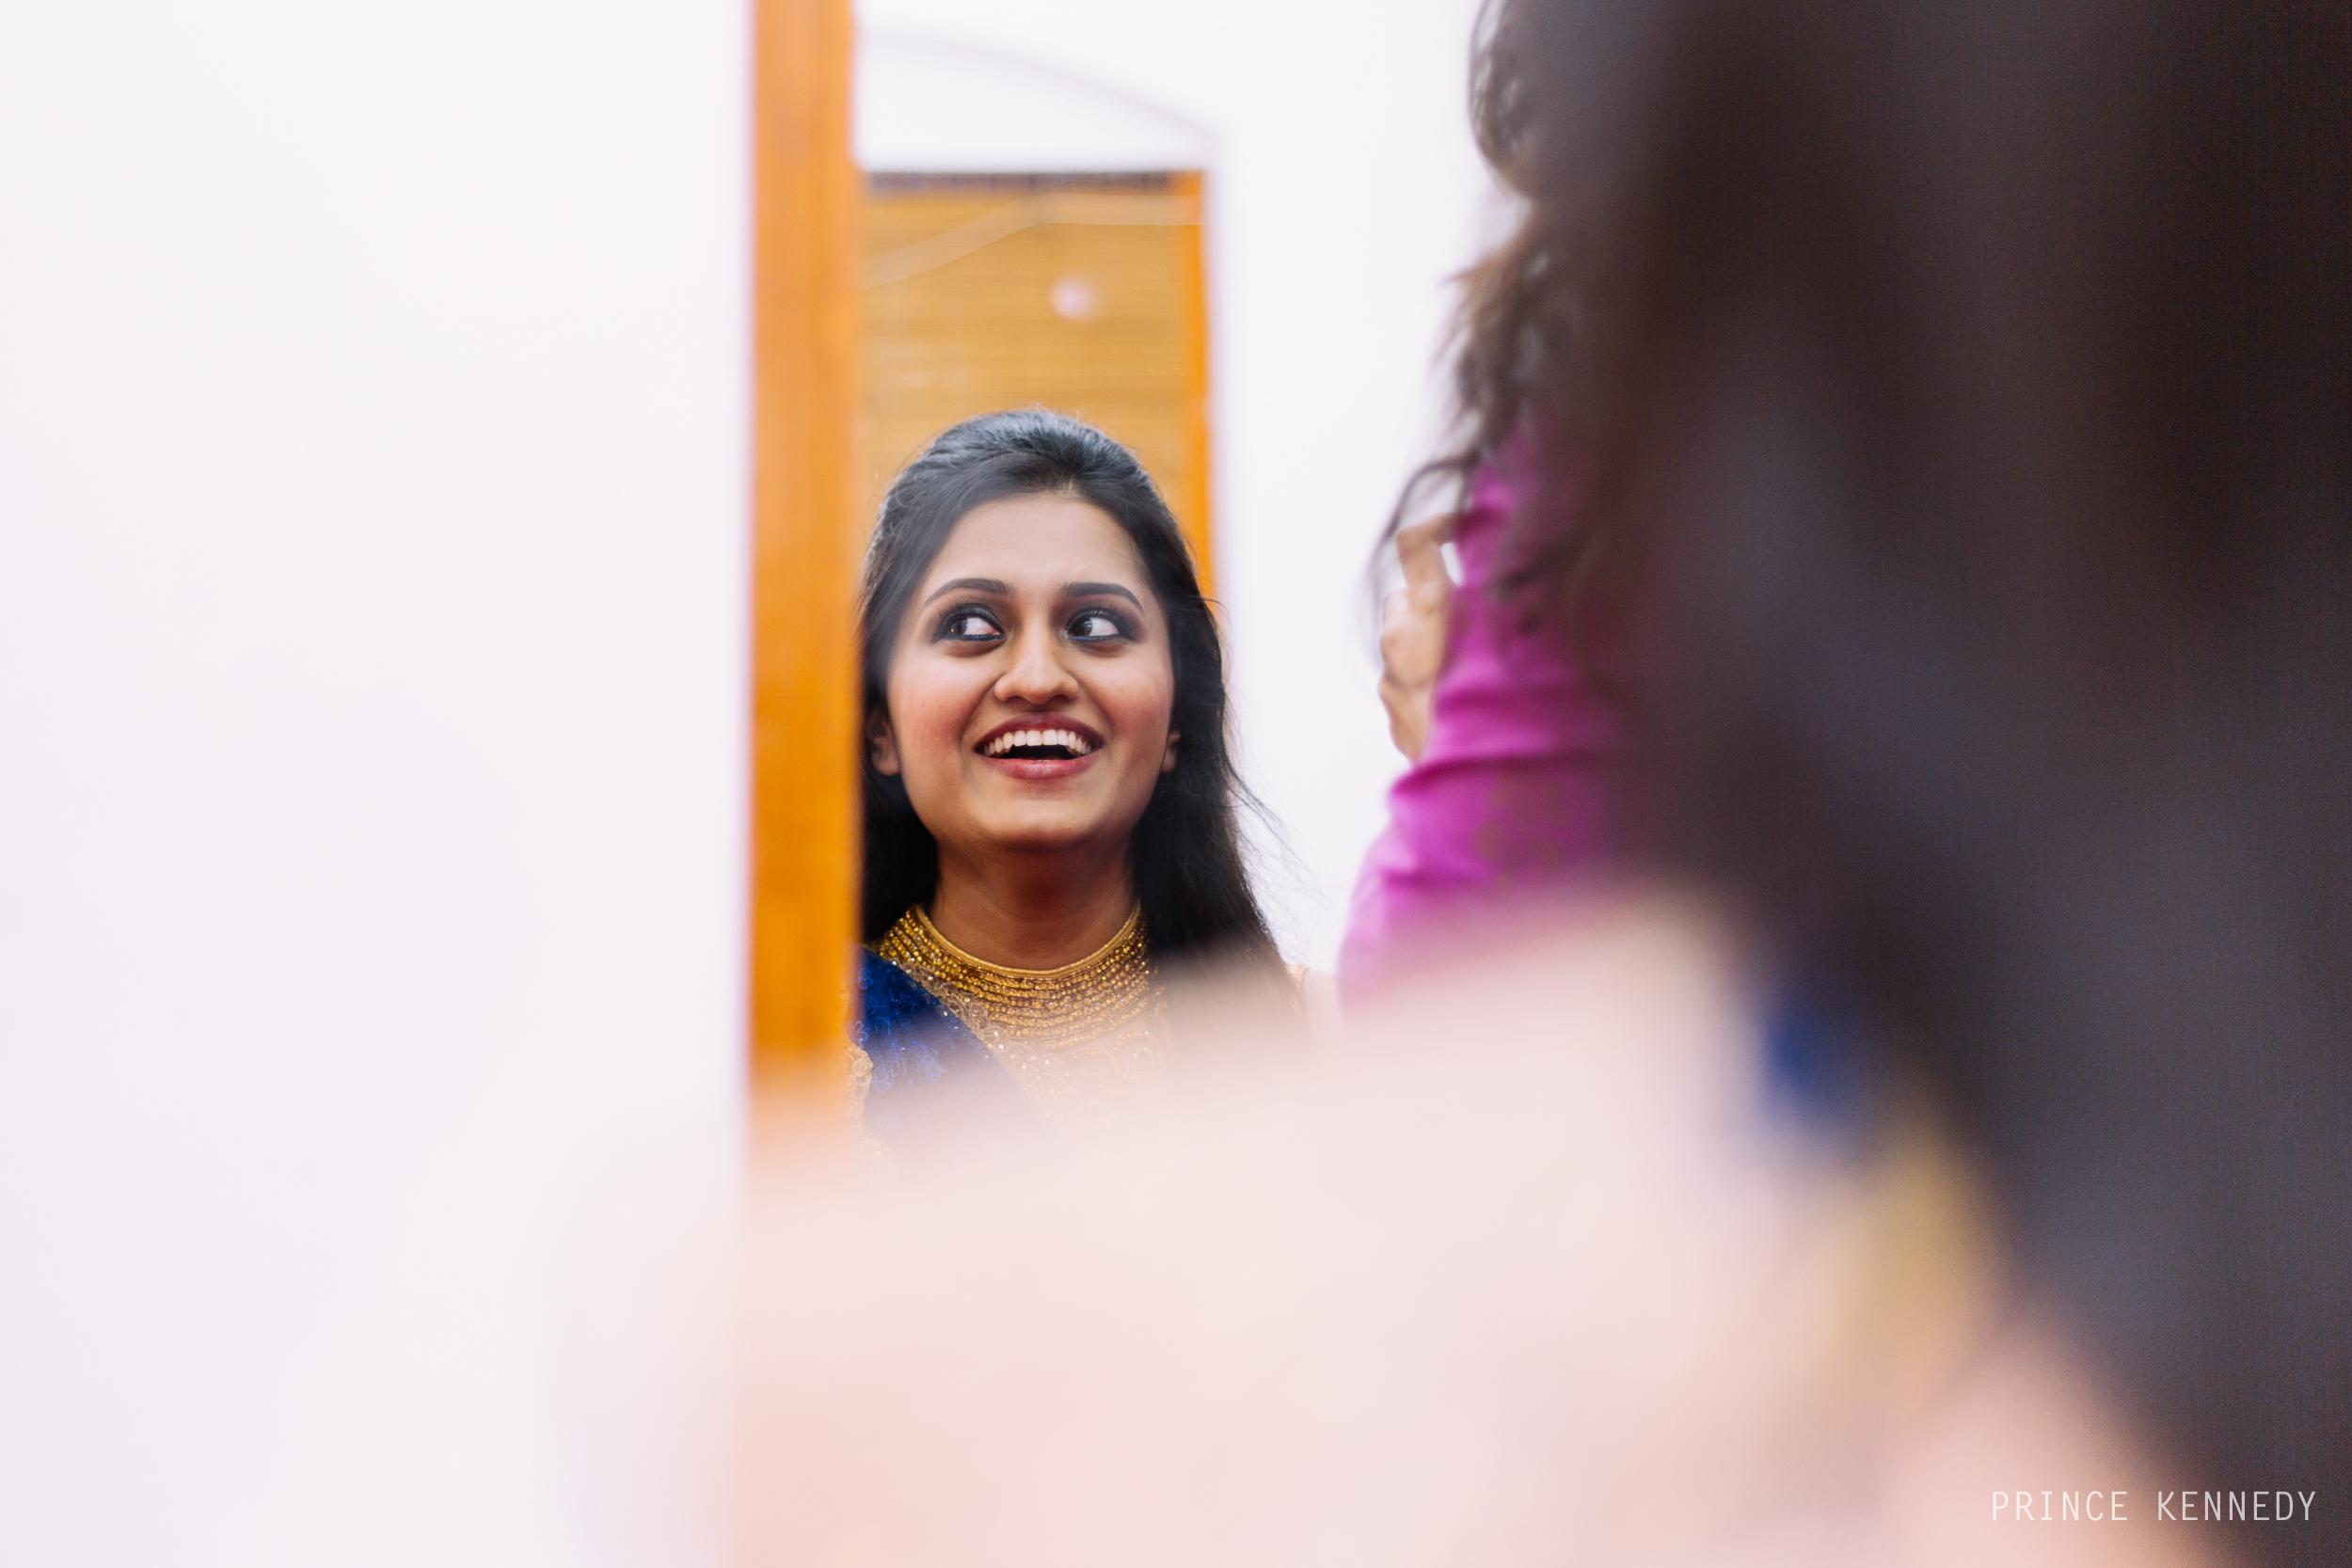 Athmajja-Nithesh-Engagement-Couple-Portrait-Portraiture-Wedding-Couple-Portrait-Chennai-Photographer-Candid-Photography-Destination-Best-Prince-Kennedy-Photography-18.jpg